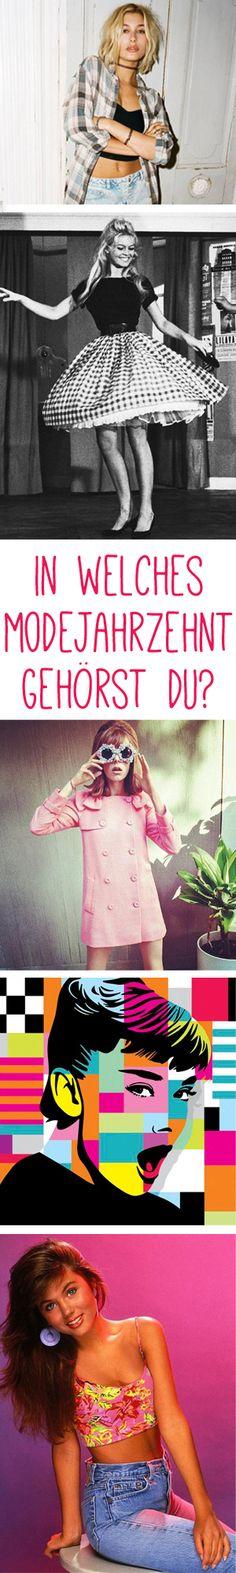 Zeitreise-Test: Welches Modejahrzehnt passt zu dir?  http://www.gofeminin.de/modetrends/welches-modejahrzehnt-passt-zu-dir-s1436047.html #50s #60s #70s #80s #90s #ninties #eighties #seventies #sixties #fifties #fünziger #achtziger #neunziger #vintage #mode #fashion